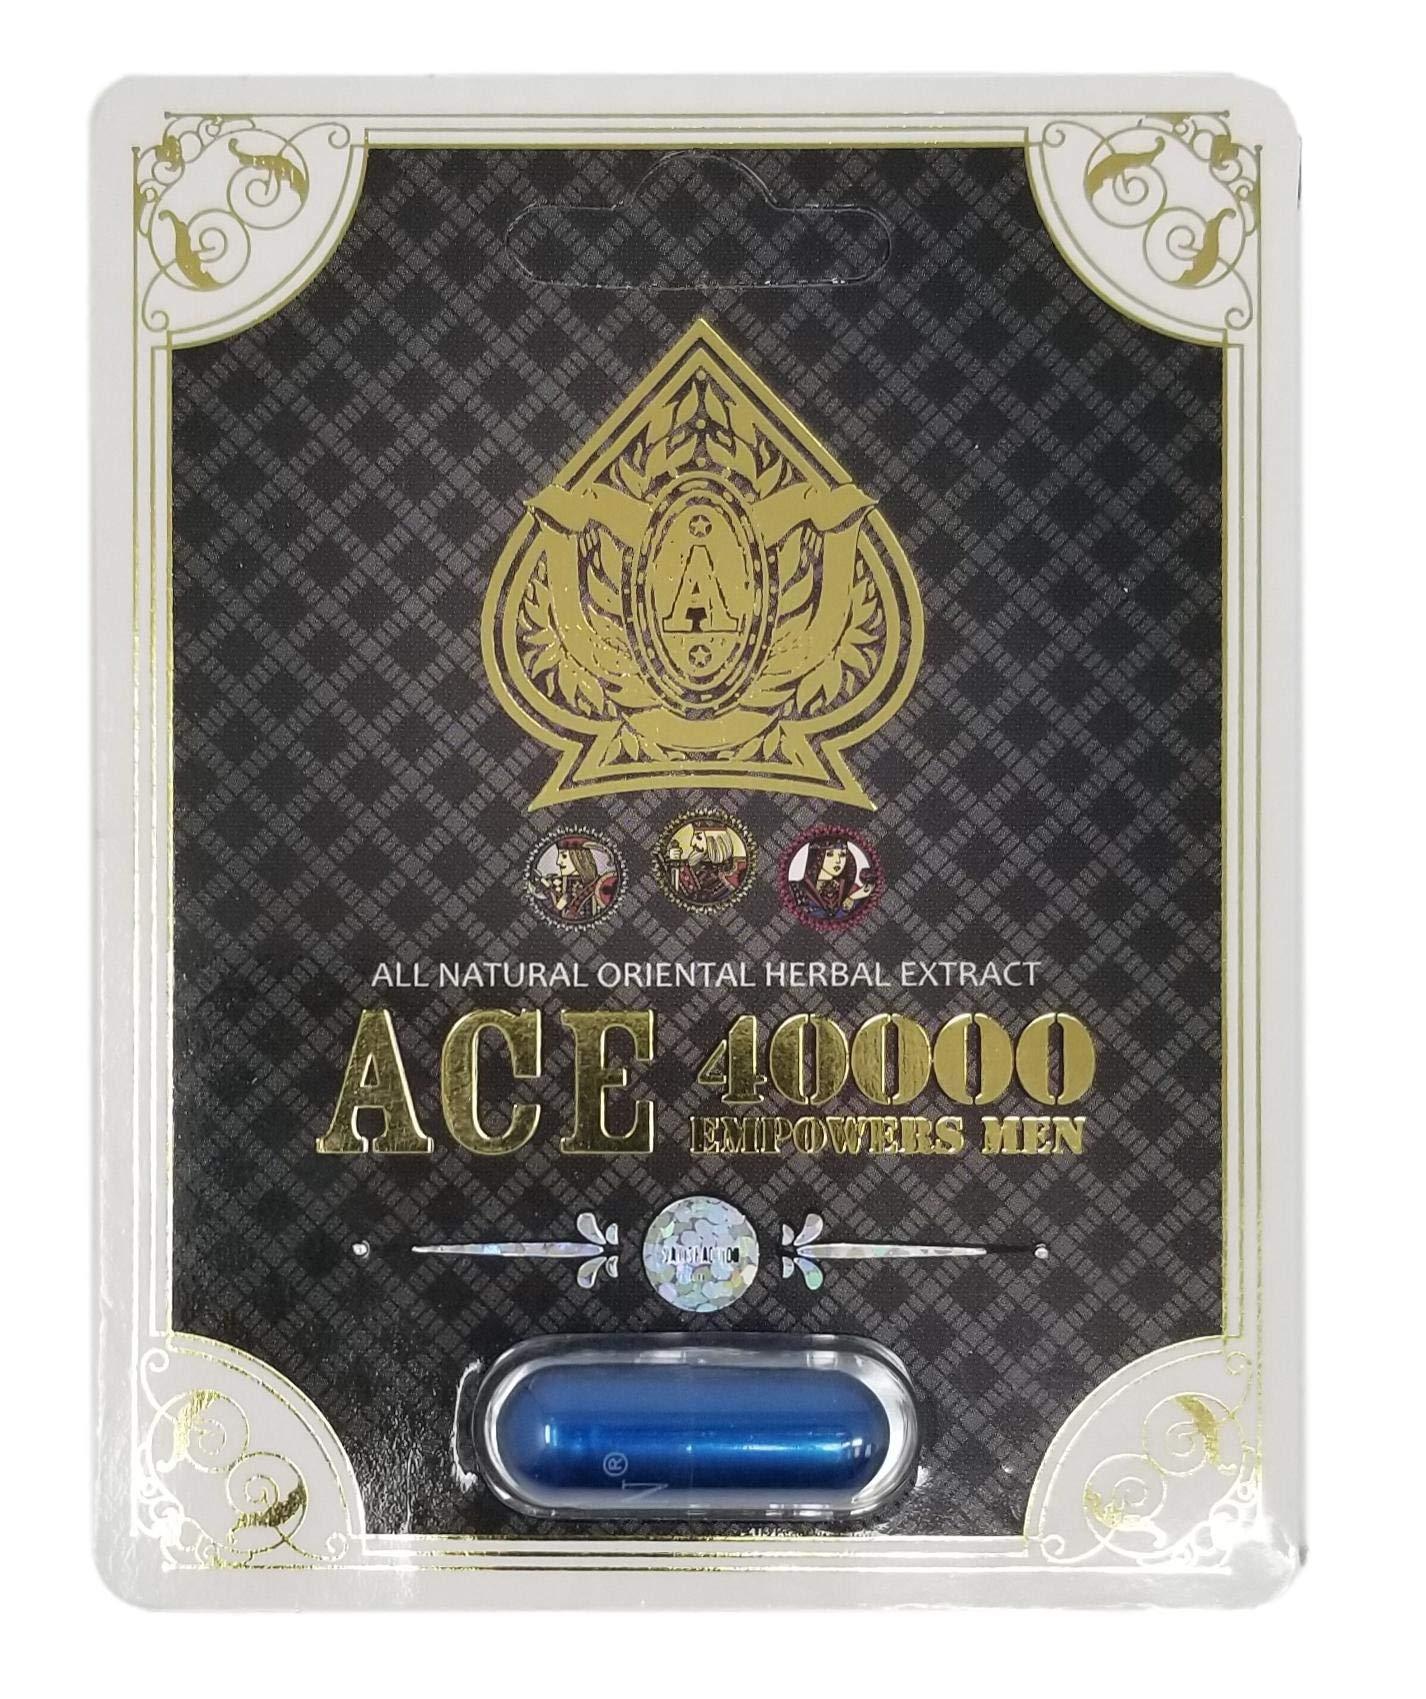 New Burro EN Primavera 30000 (10 Pack) All Natural Male Enhancement Sex Pills Increase Libido Stamina Energy Booster w/Bonus Royal Ace 40000 (1 Pill) by FunThingsForMe